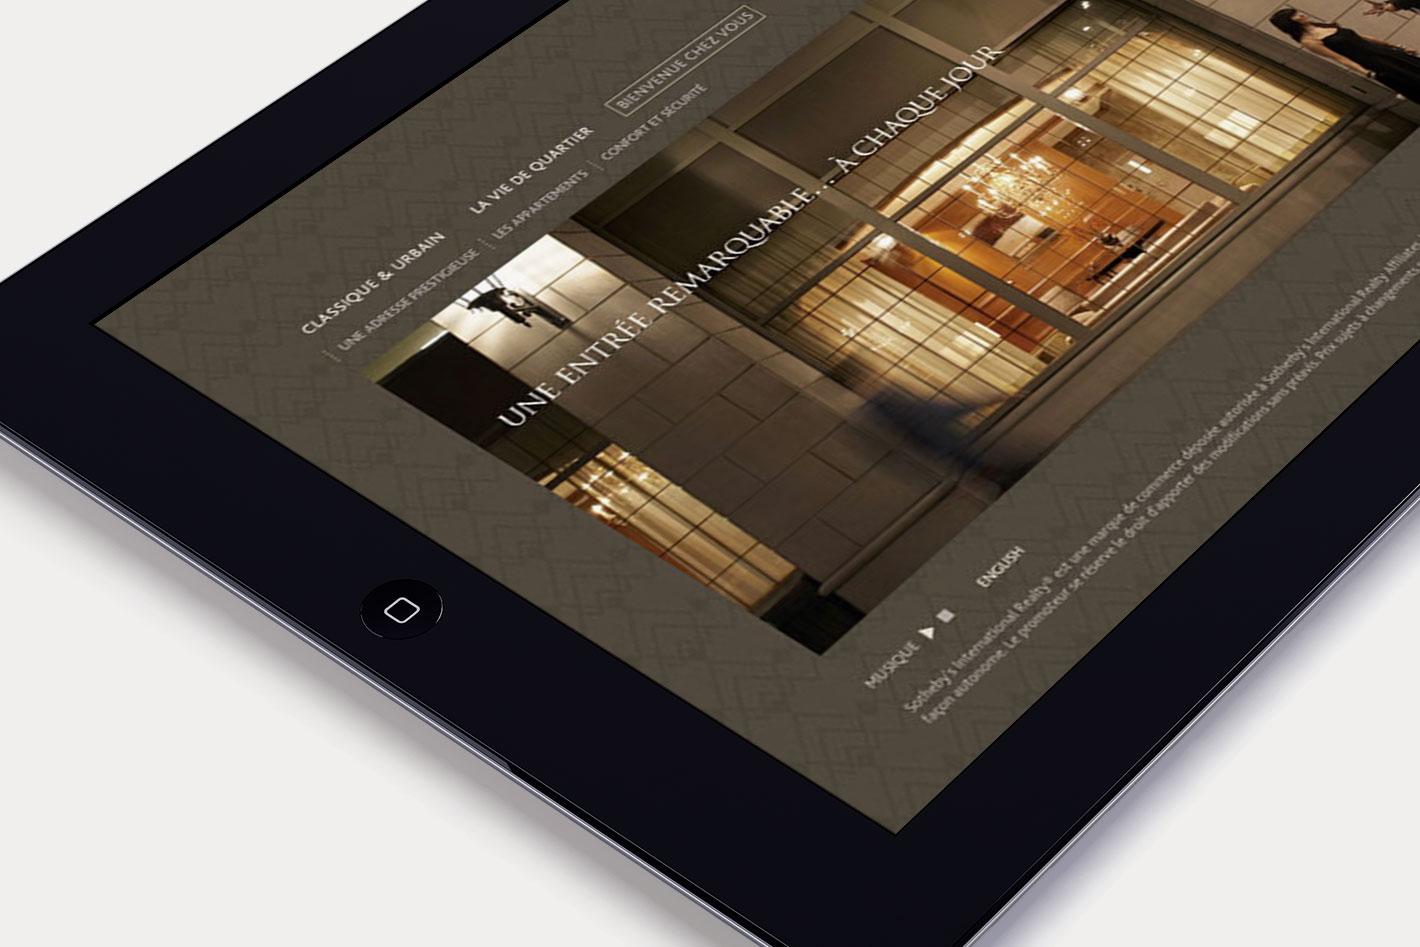 1200Maisonneuve_IMGS_1420x947-iPad-Angle